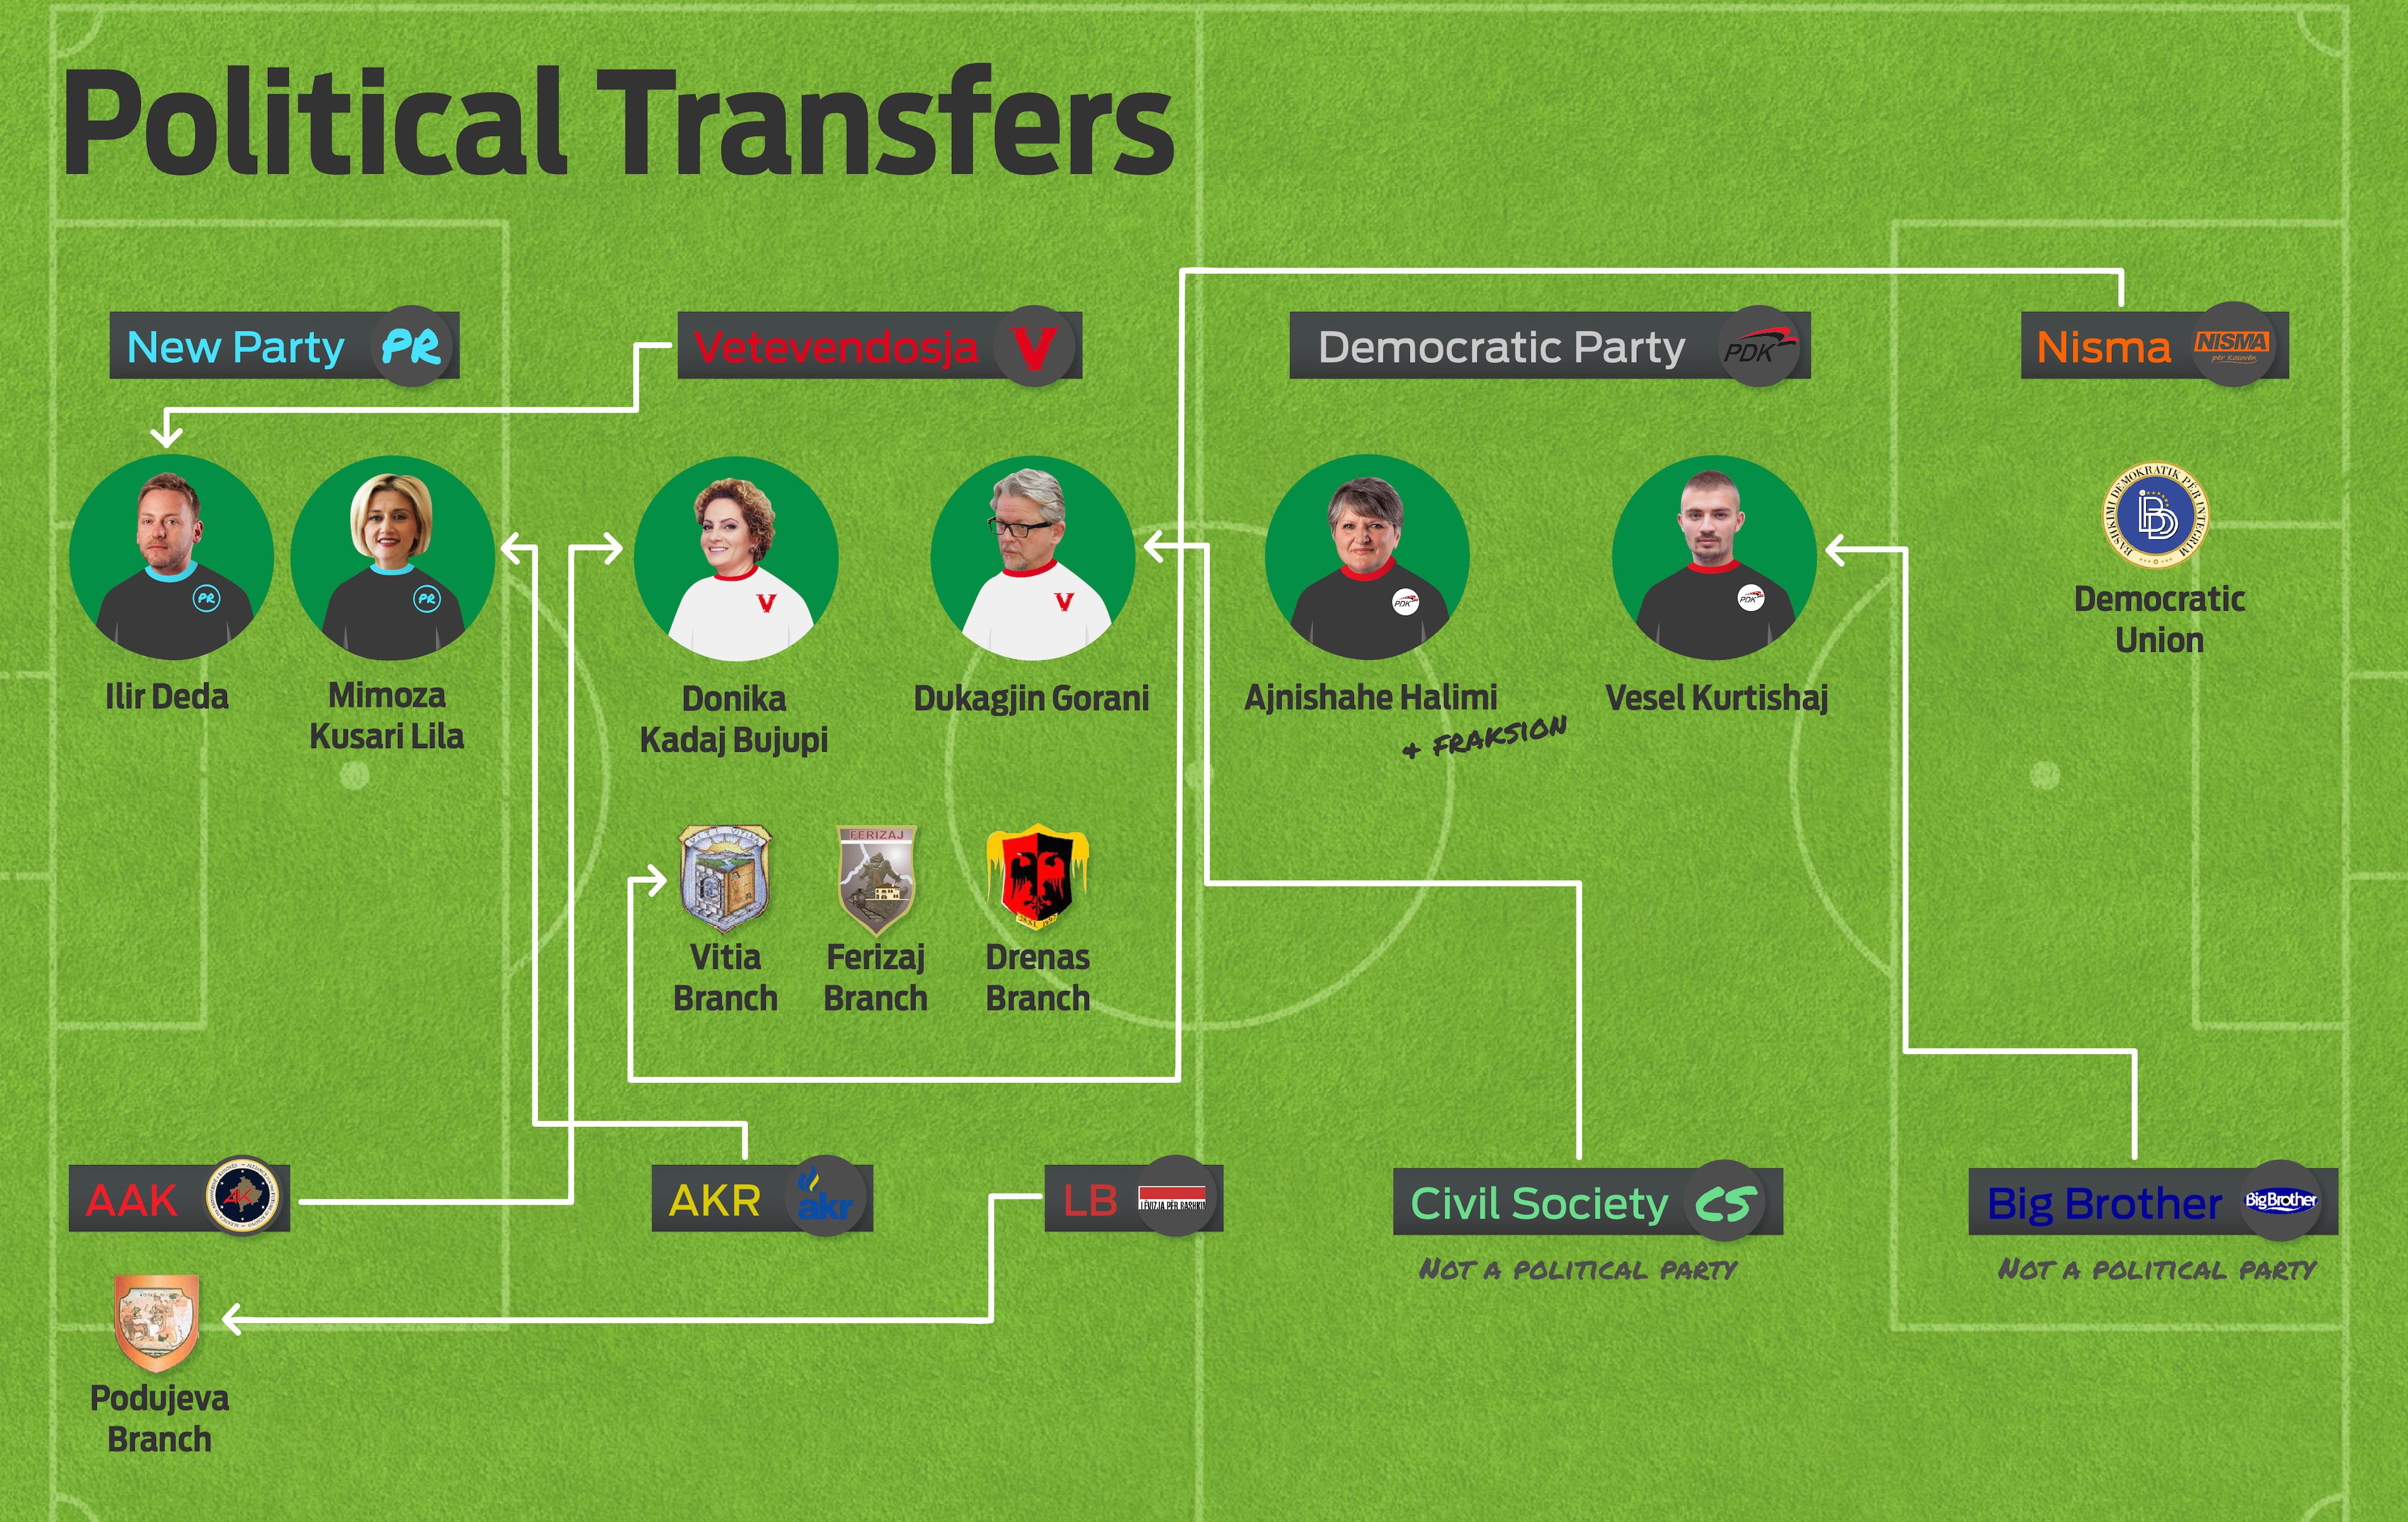 Political Transfers